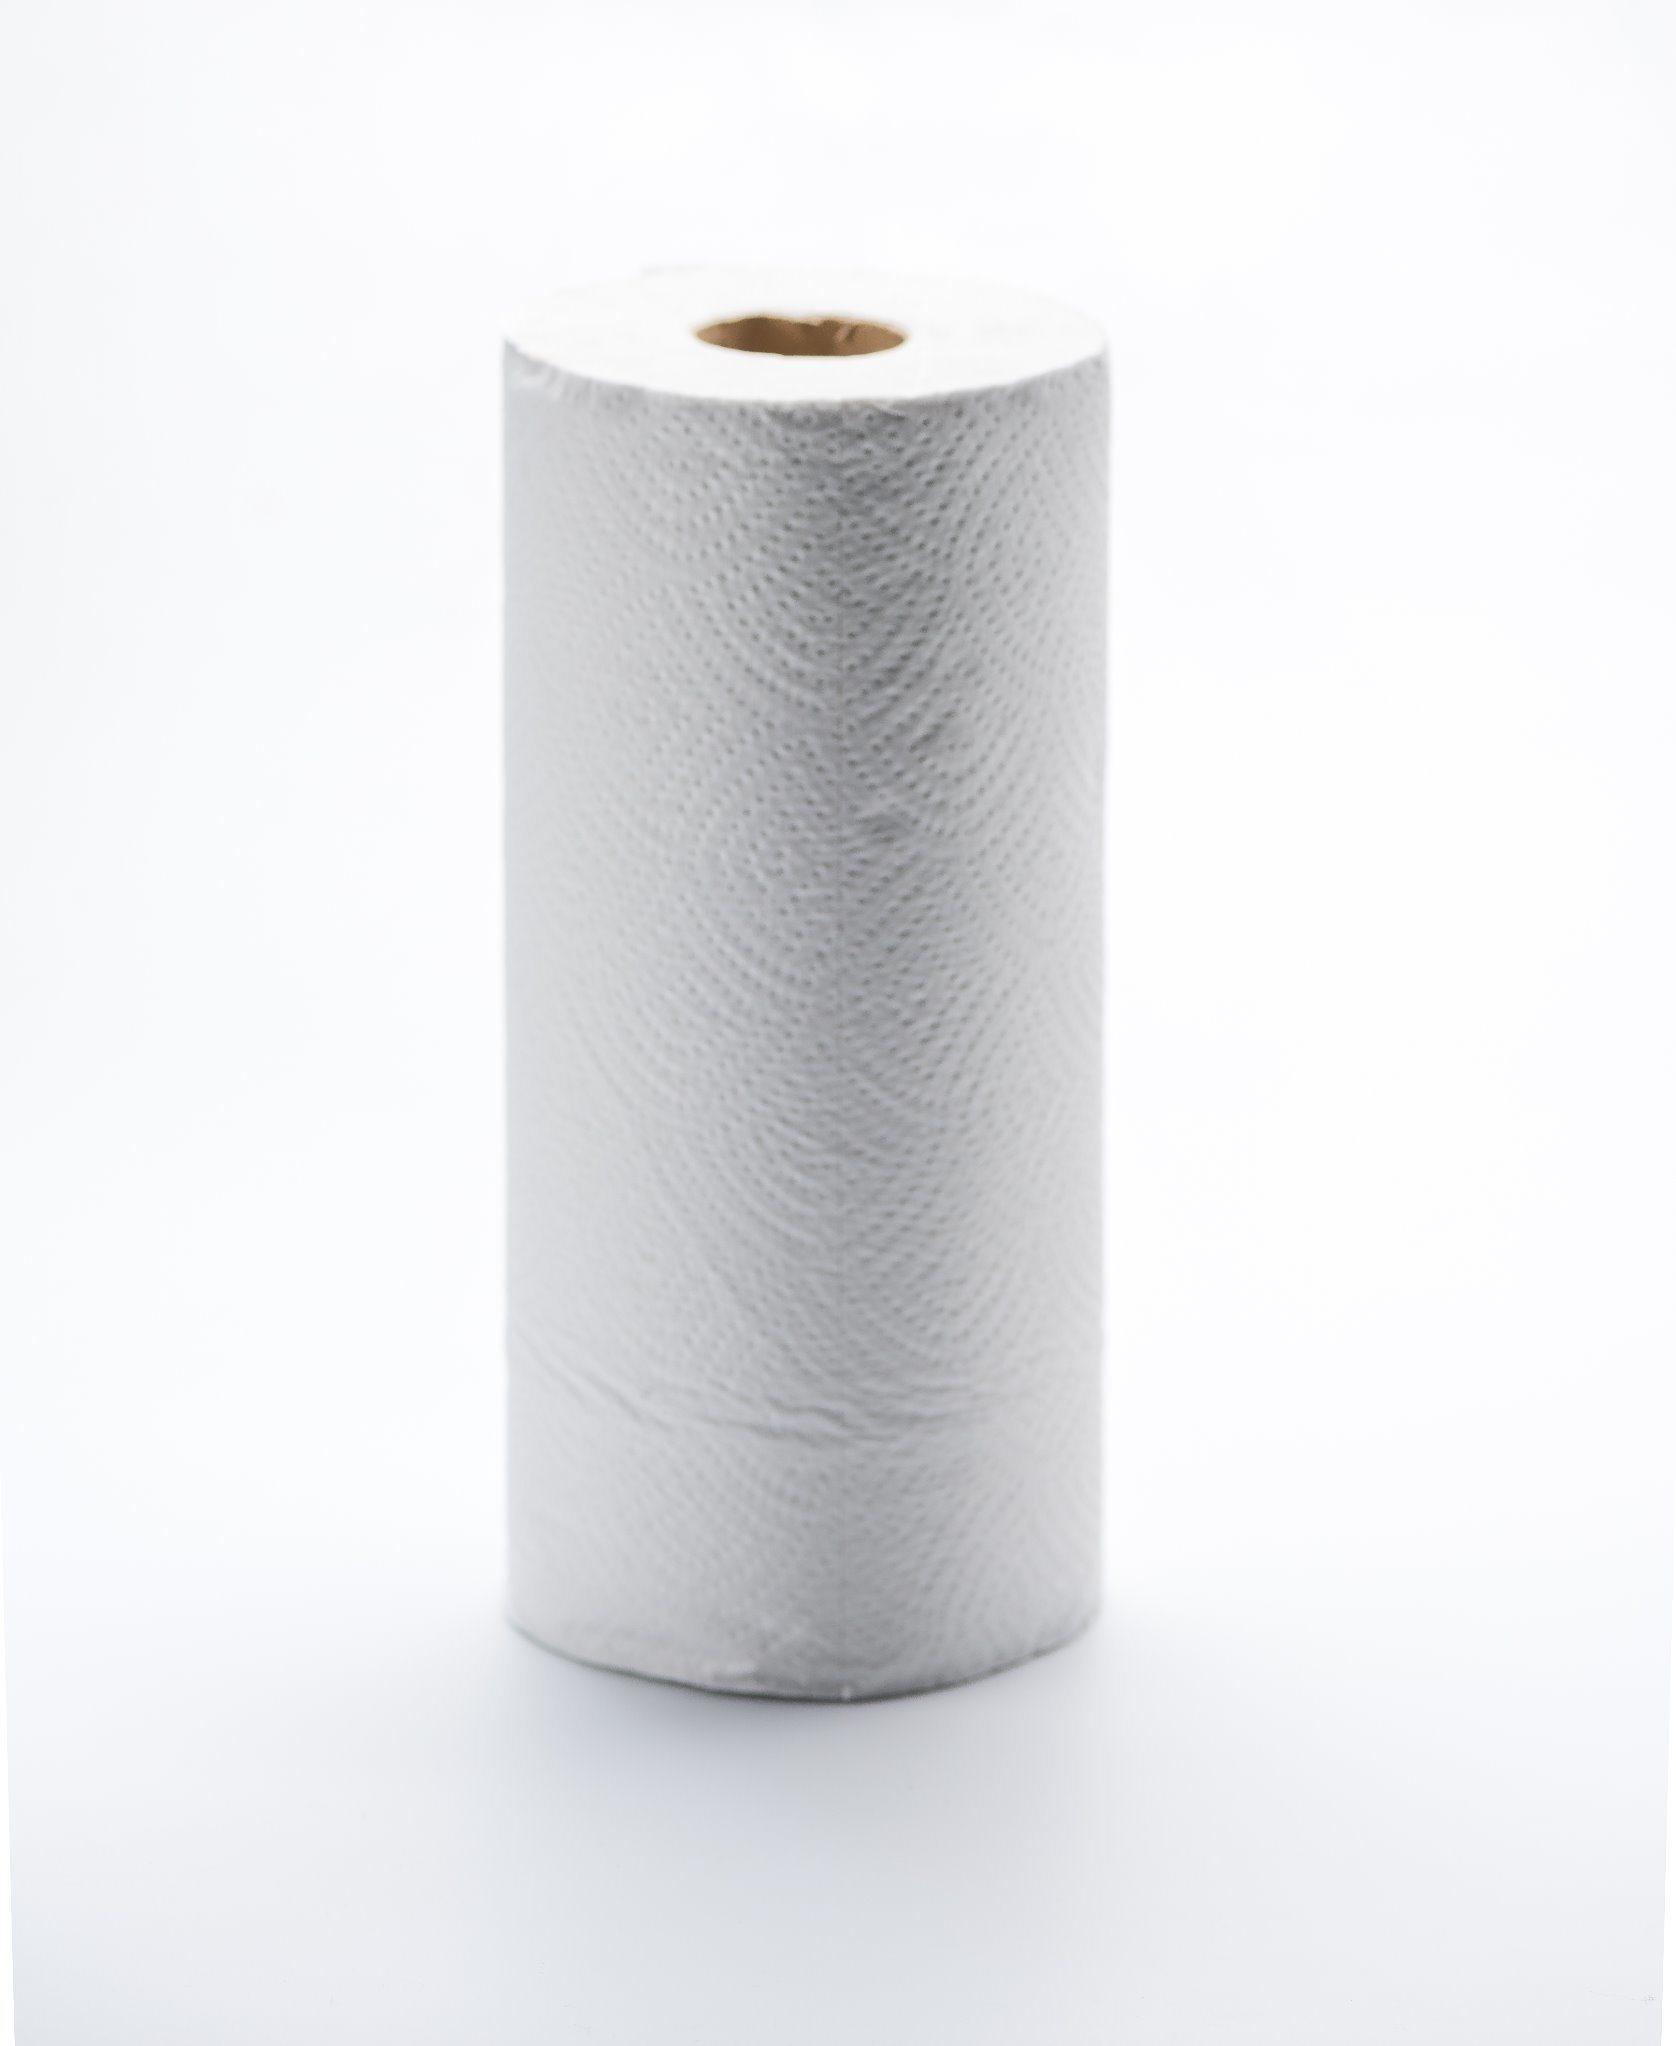 Hot Item White Hygiene Rolls Embossed Paper Tissues Kitchen Towel